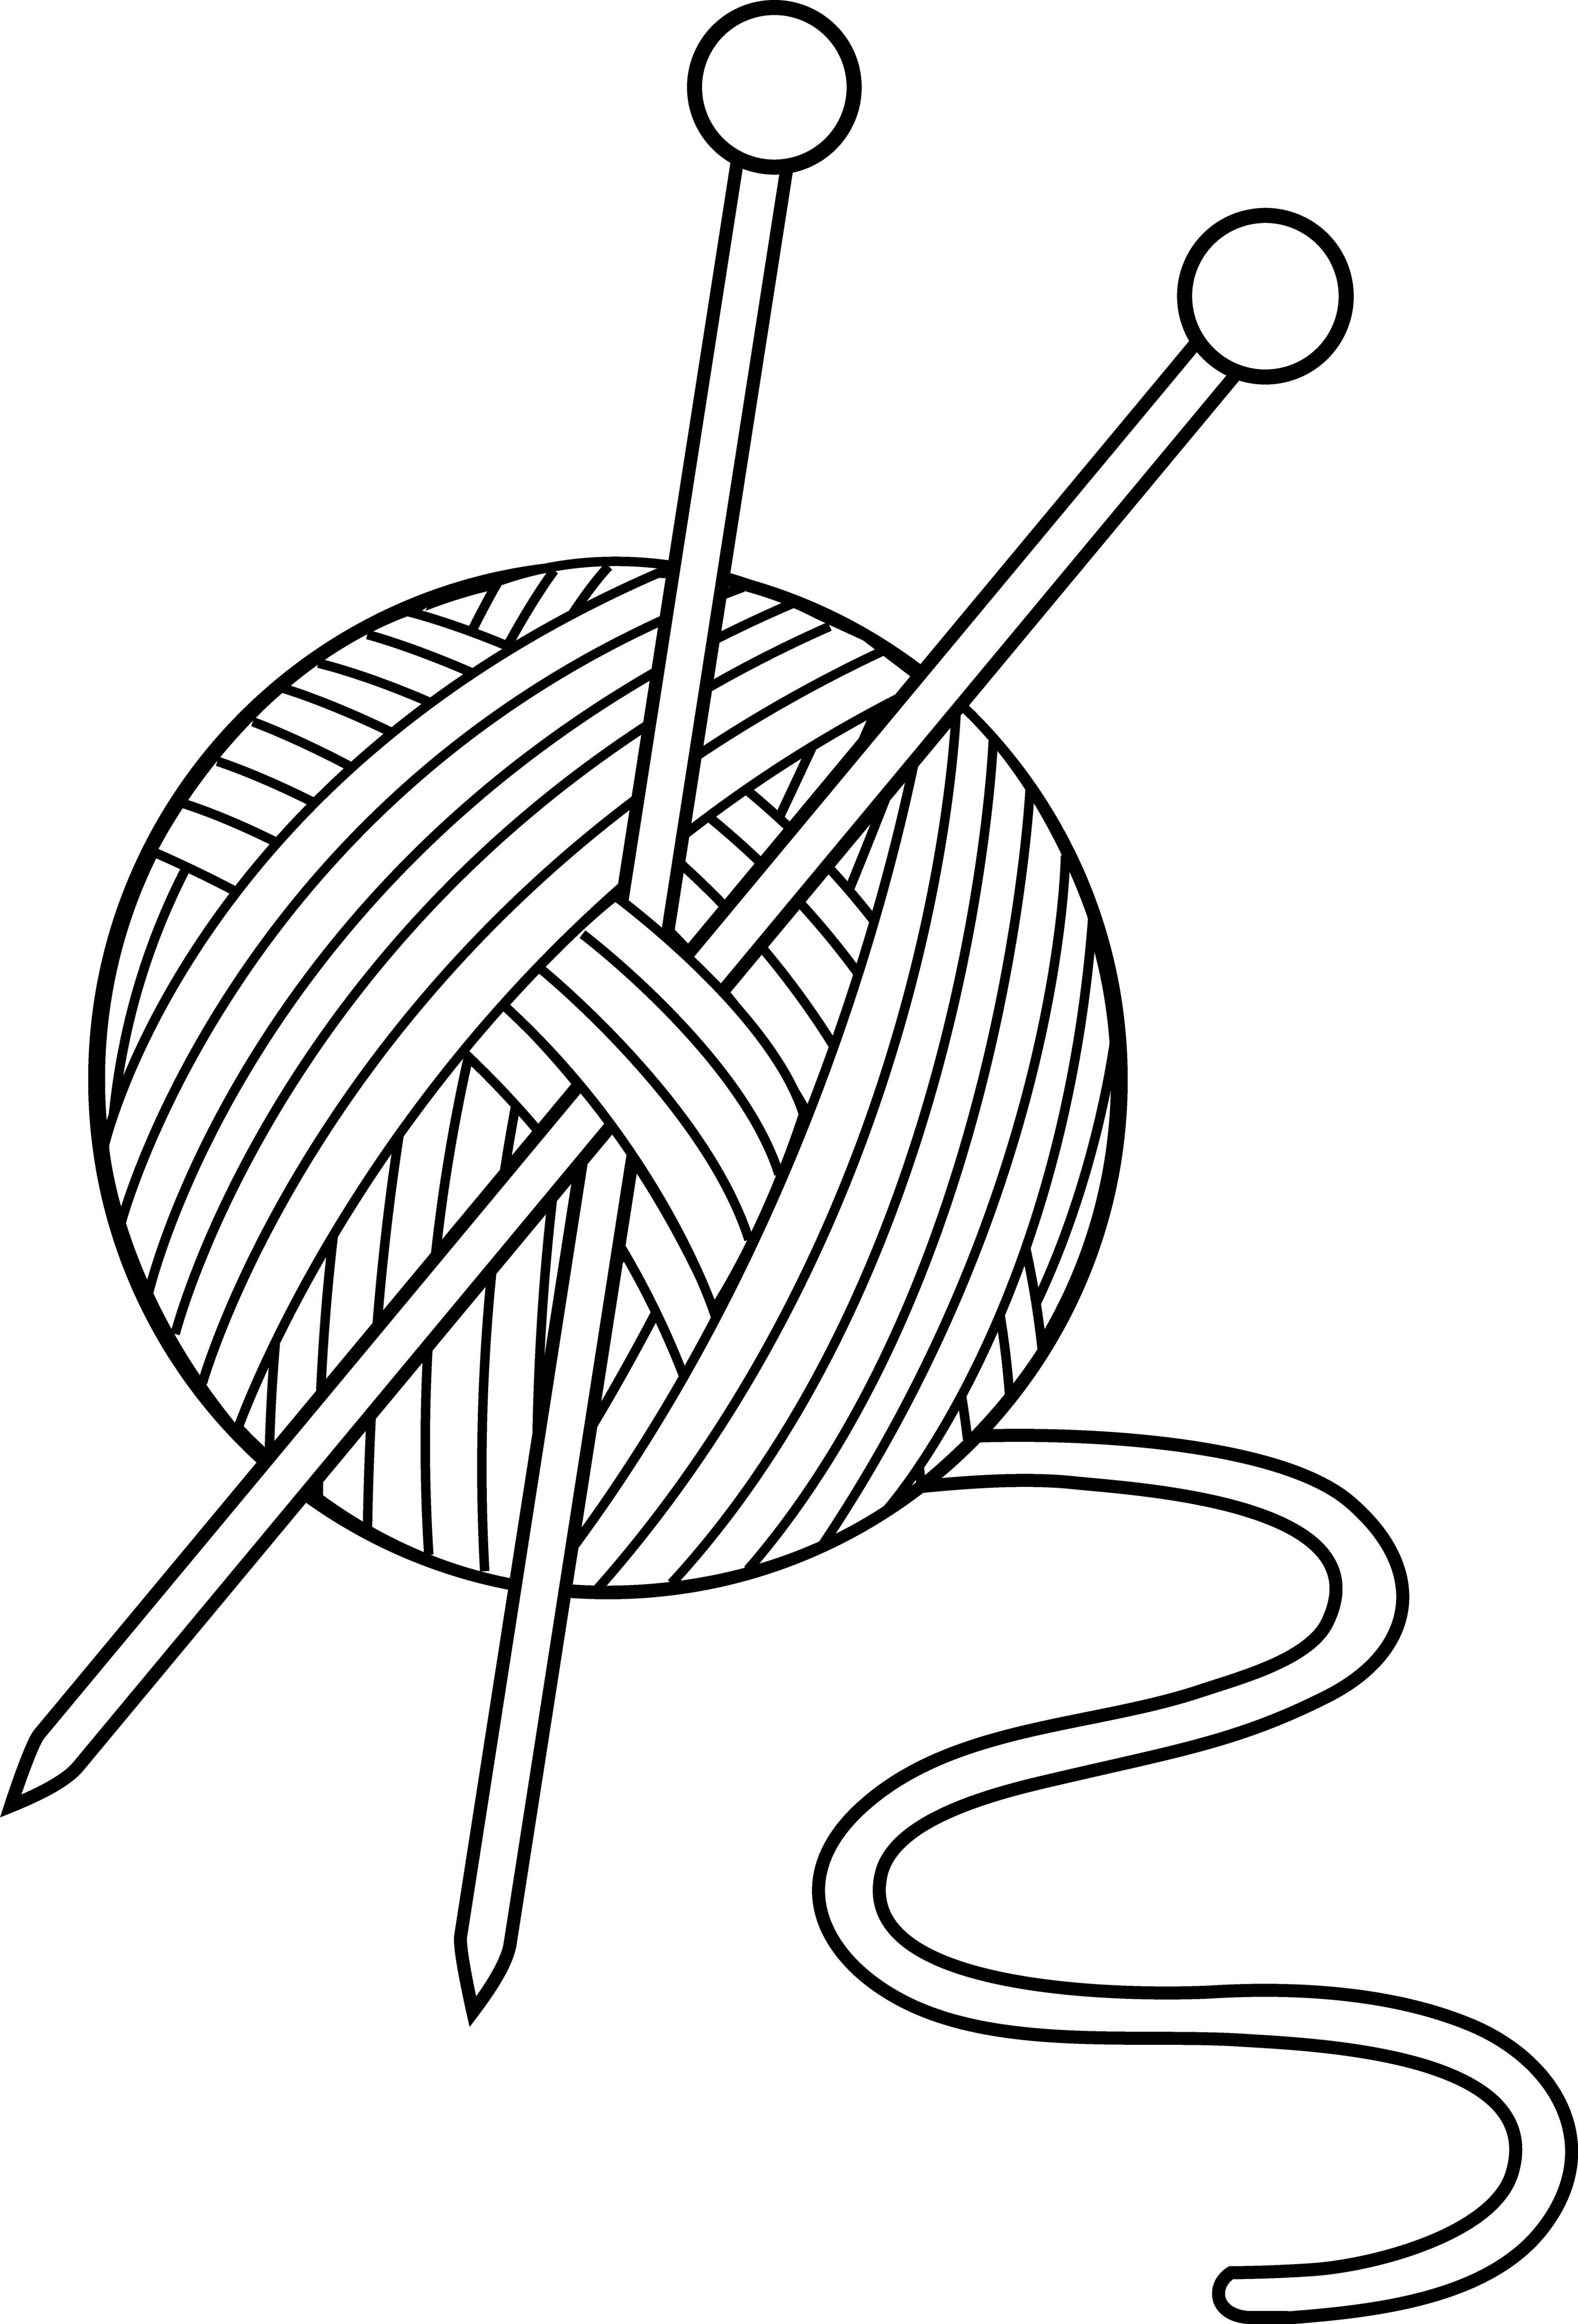 Free clipart images heart yarn knitting needles svg freeuse download Как рисовать клубок ниток | разобрать | Pinterest svg freeuse download